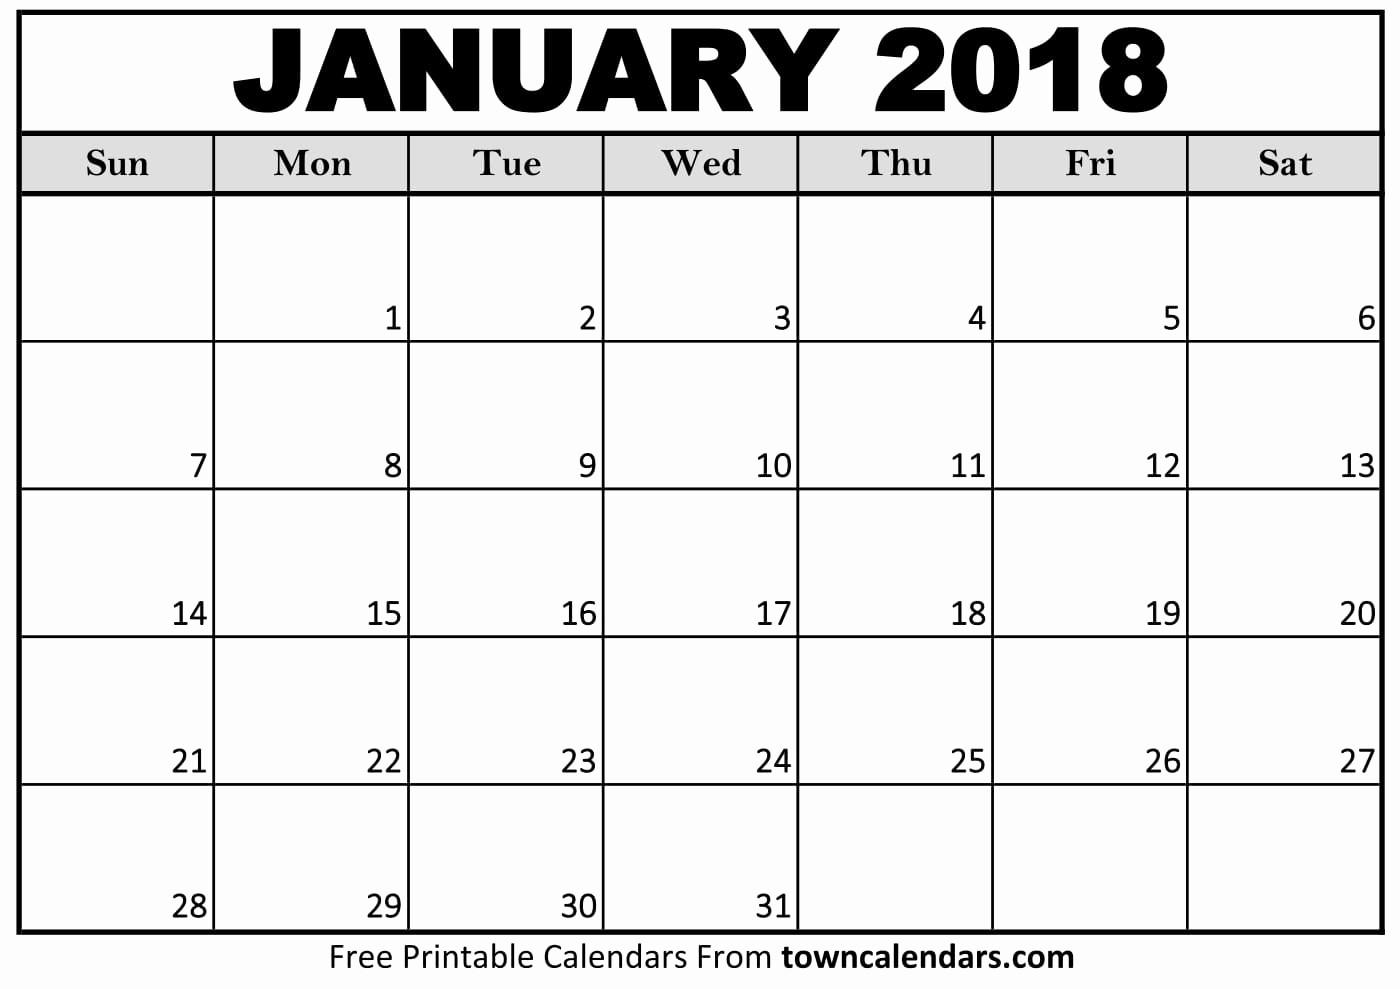 Blank January 2018 Calendar Printable Awesome Printable January 2018 Calendar towncalendars